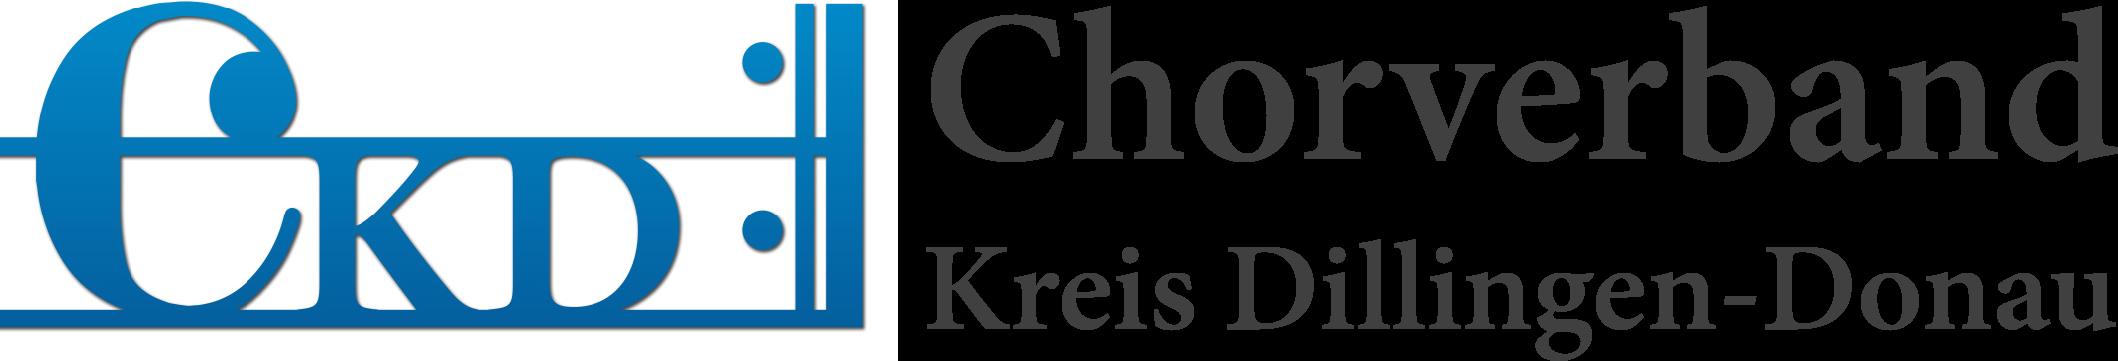 Chorverband Kreis Dillingen-Donau